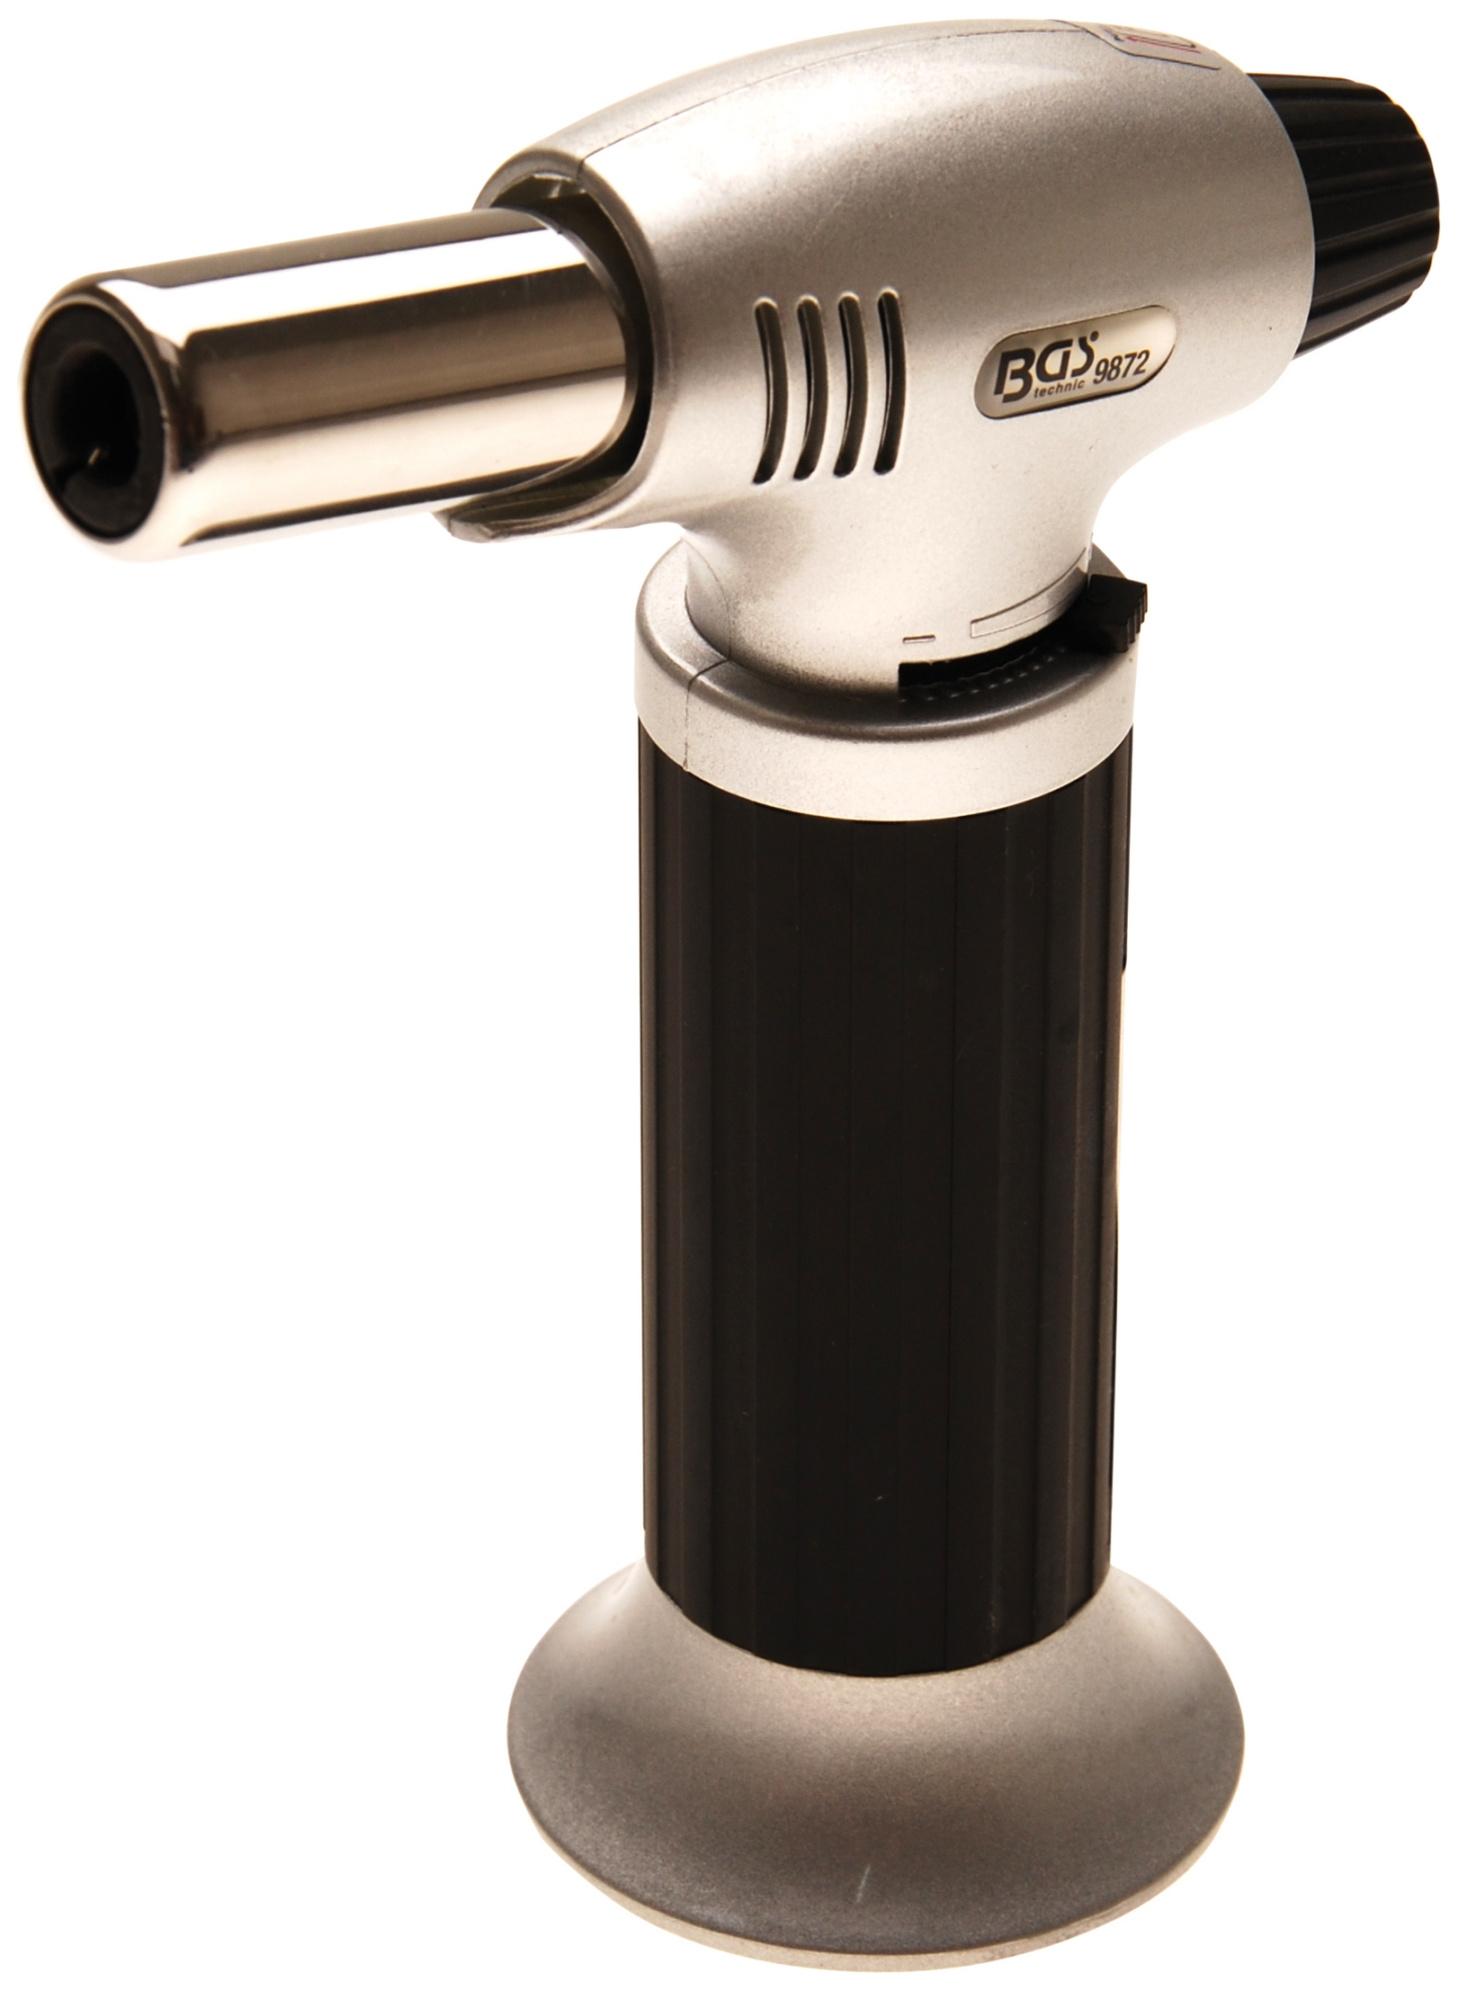 BGS 9872 Taschen Gasbrenner zum Löten, Flambieren, Entflammen